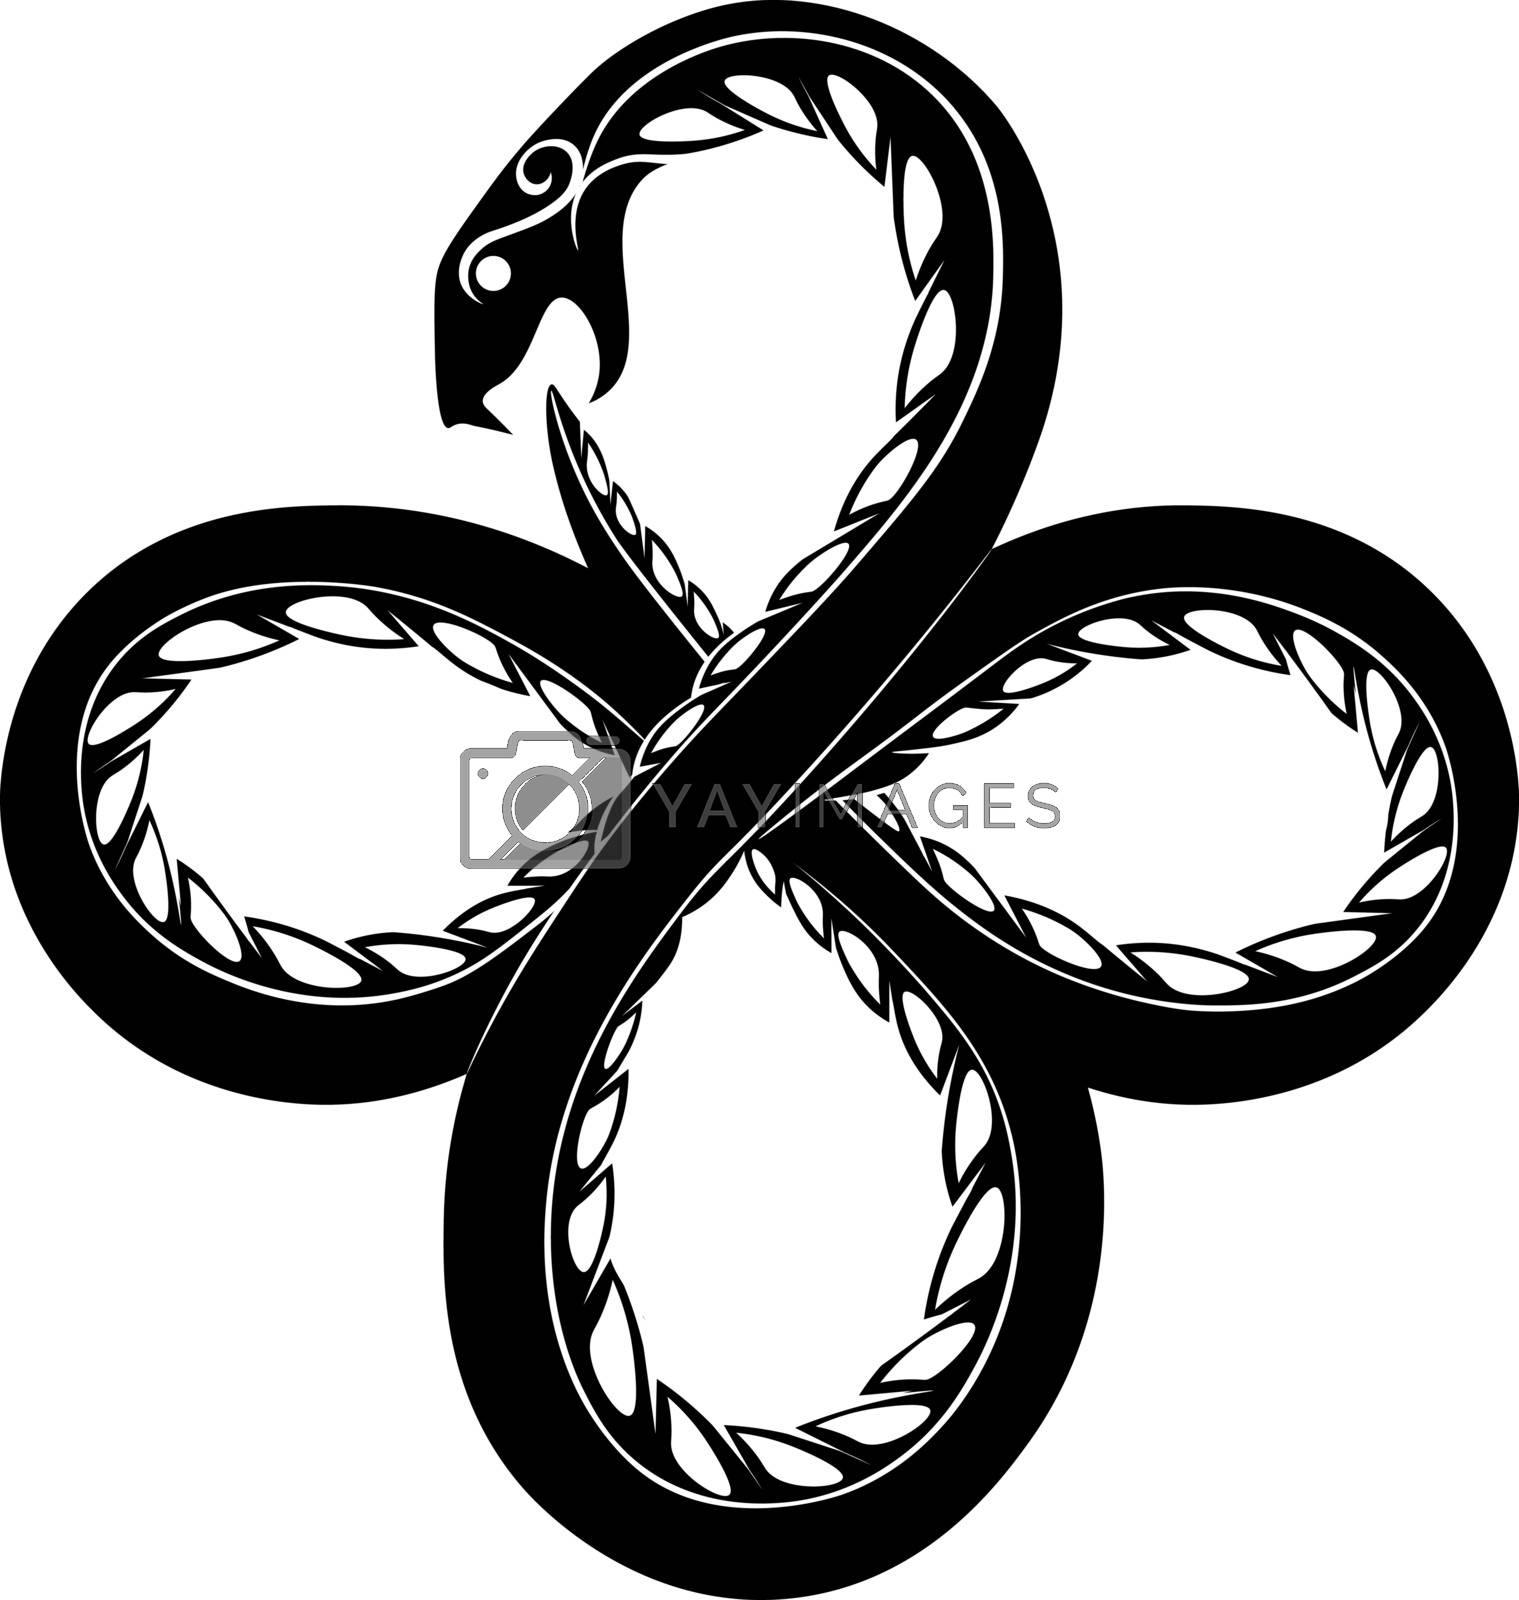 Black tatoo or print illustration of occult symbol ouroboros serpent